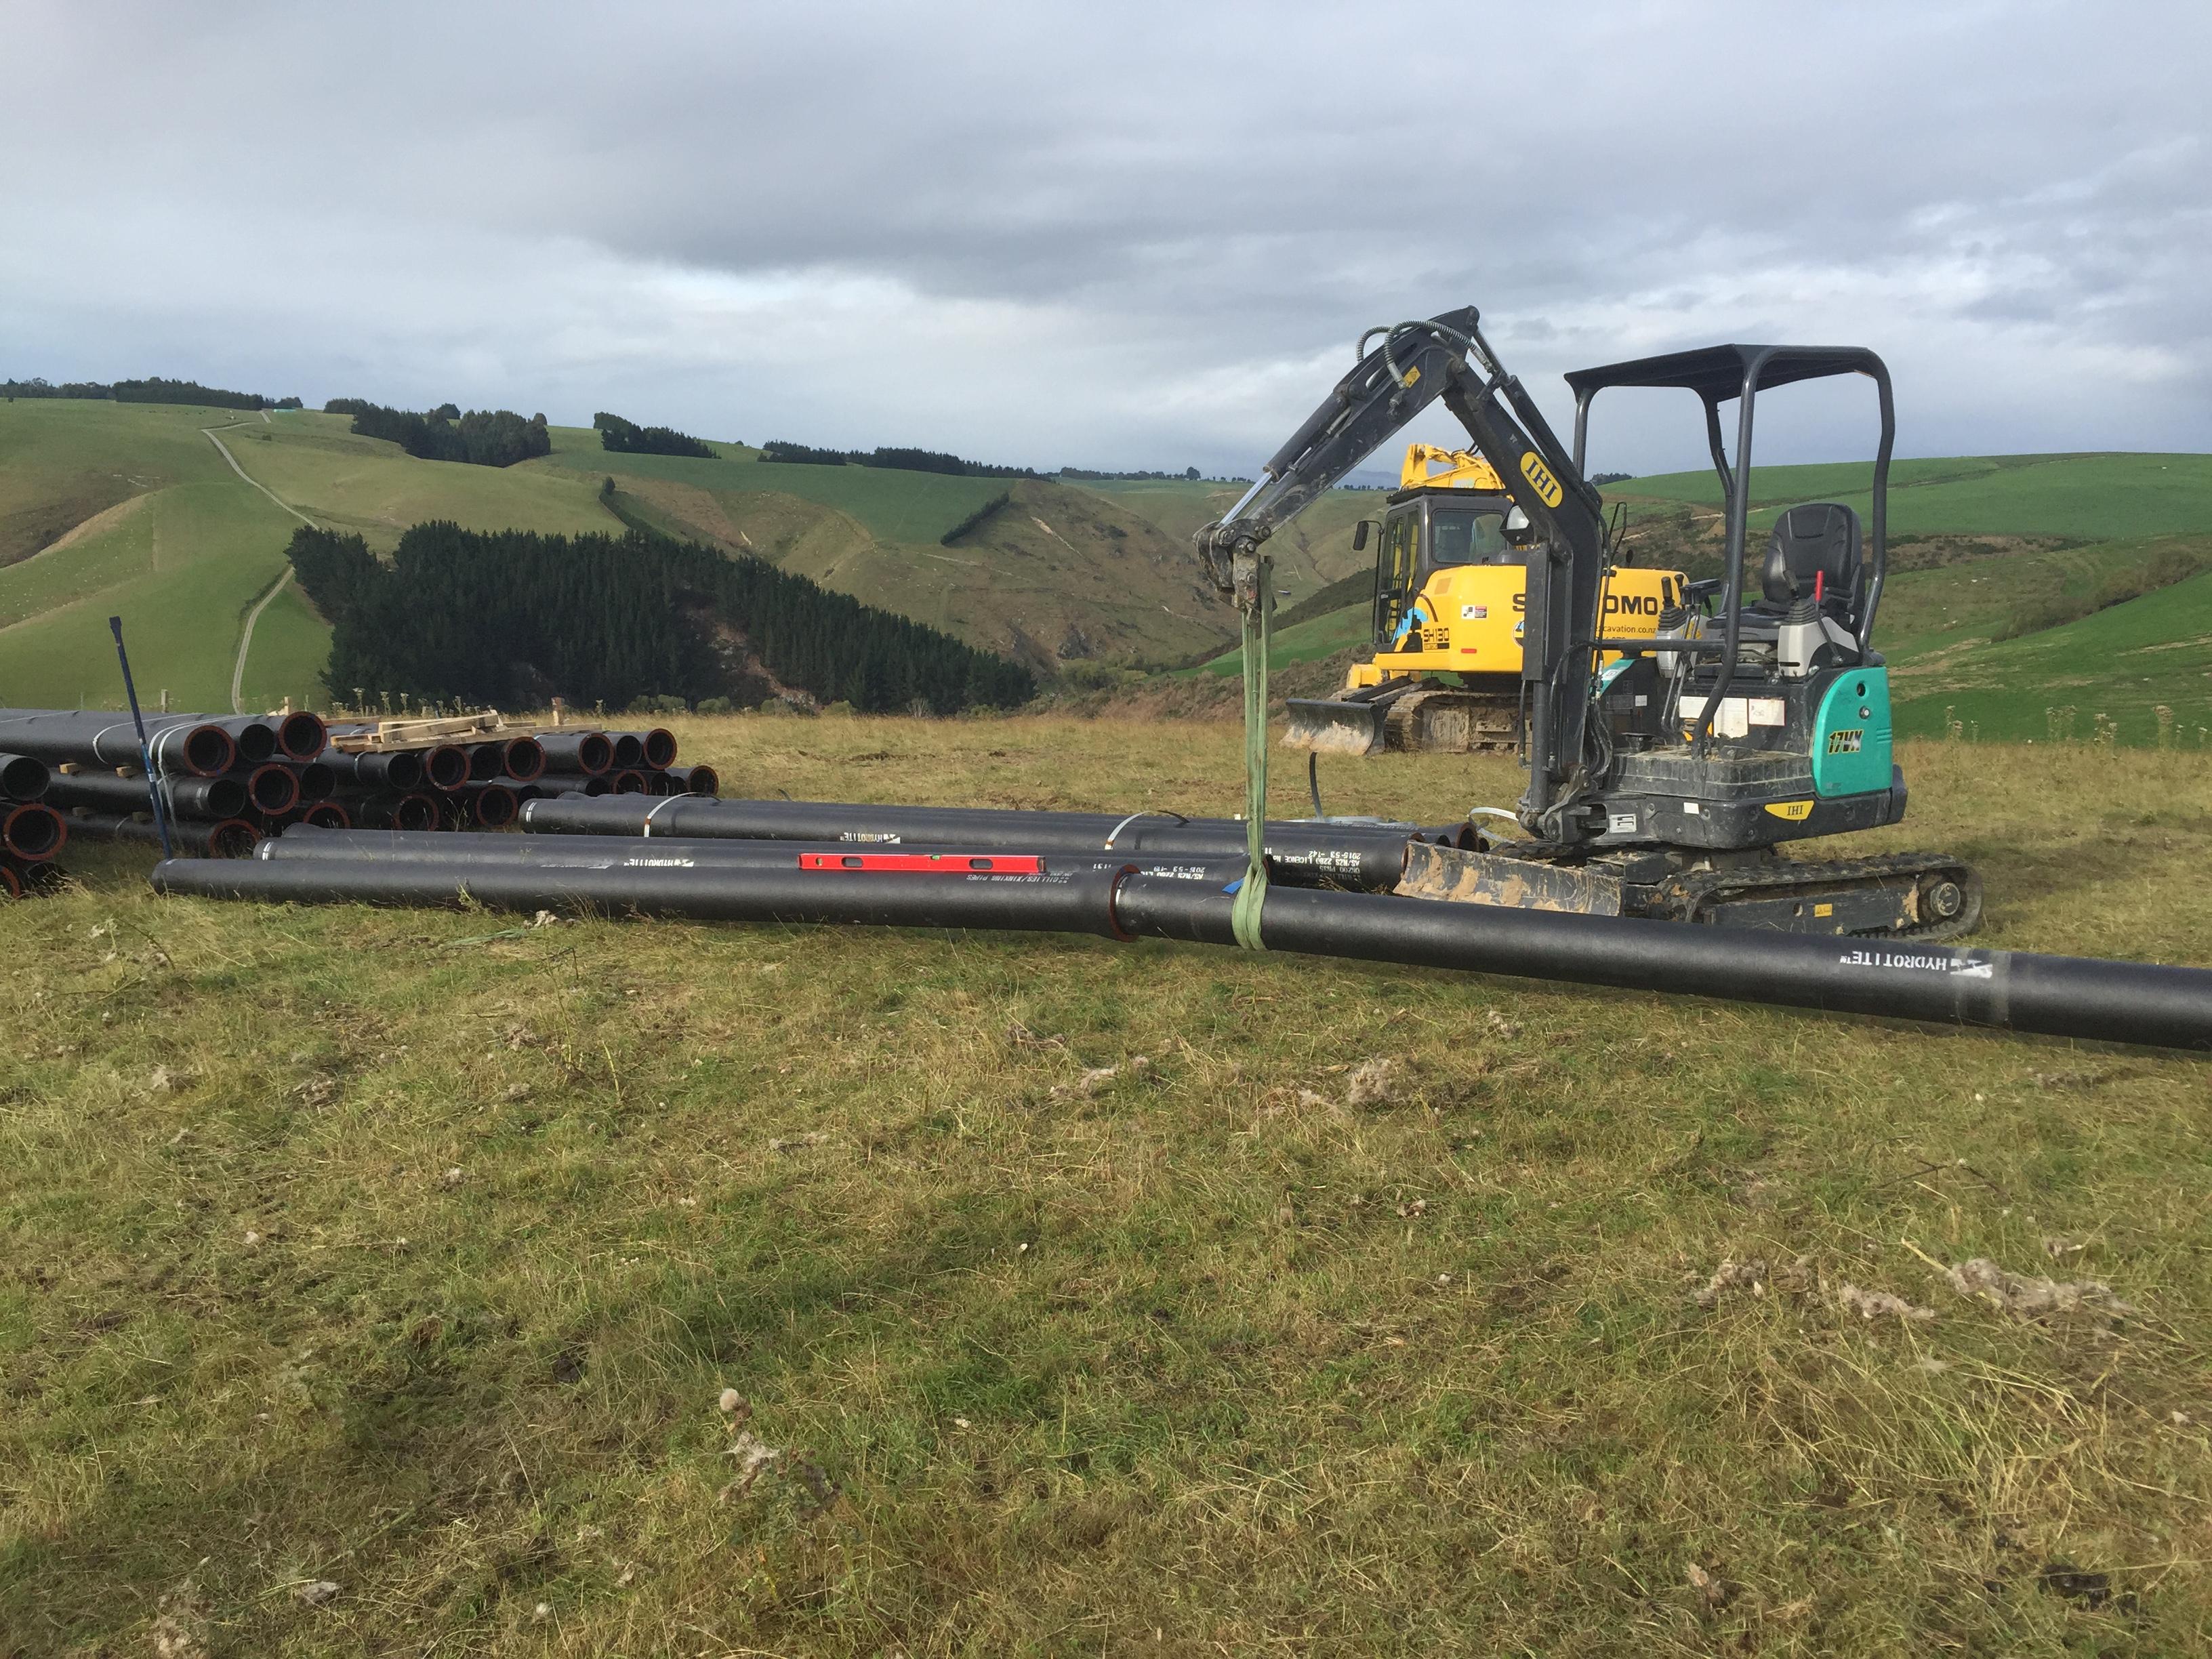 Testing maximum deflection of Ductile iron pipes